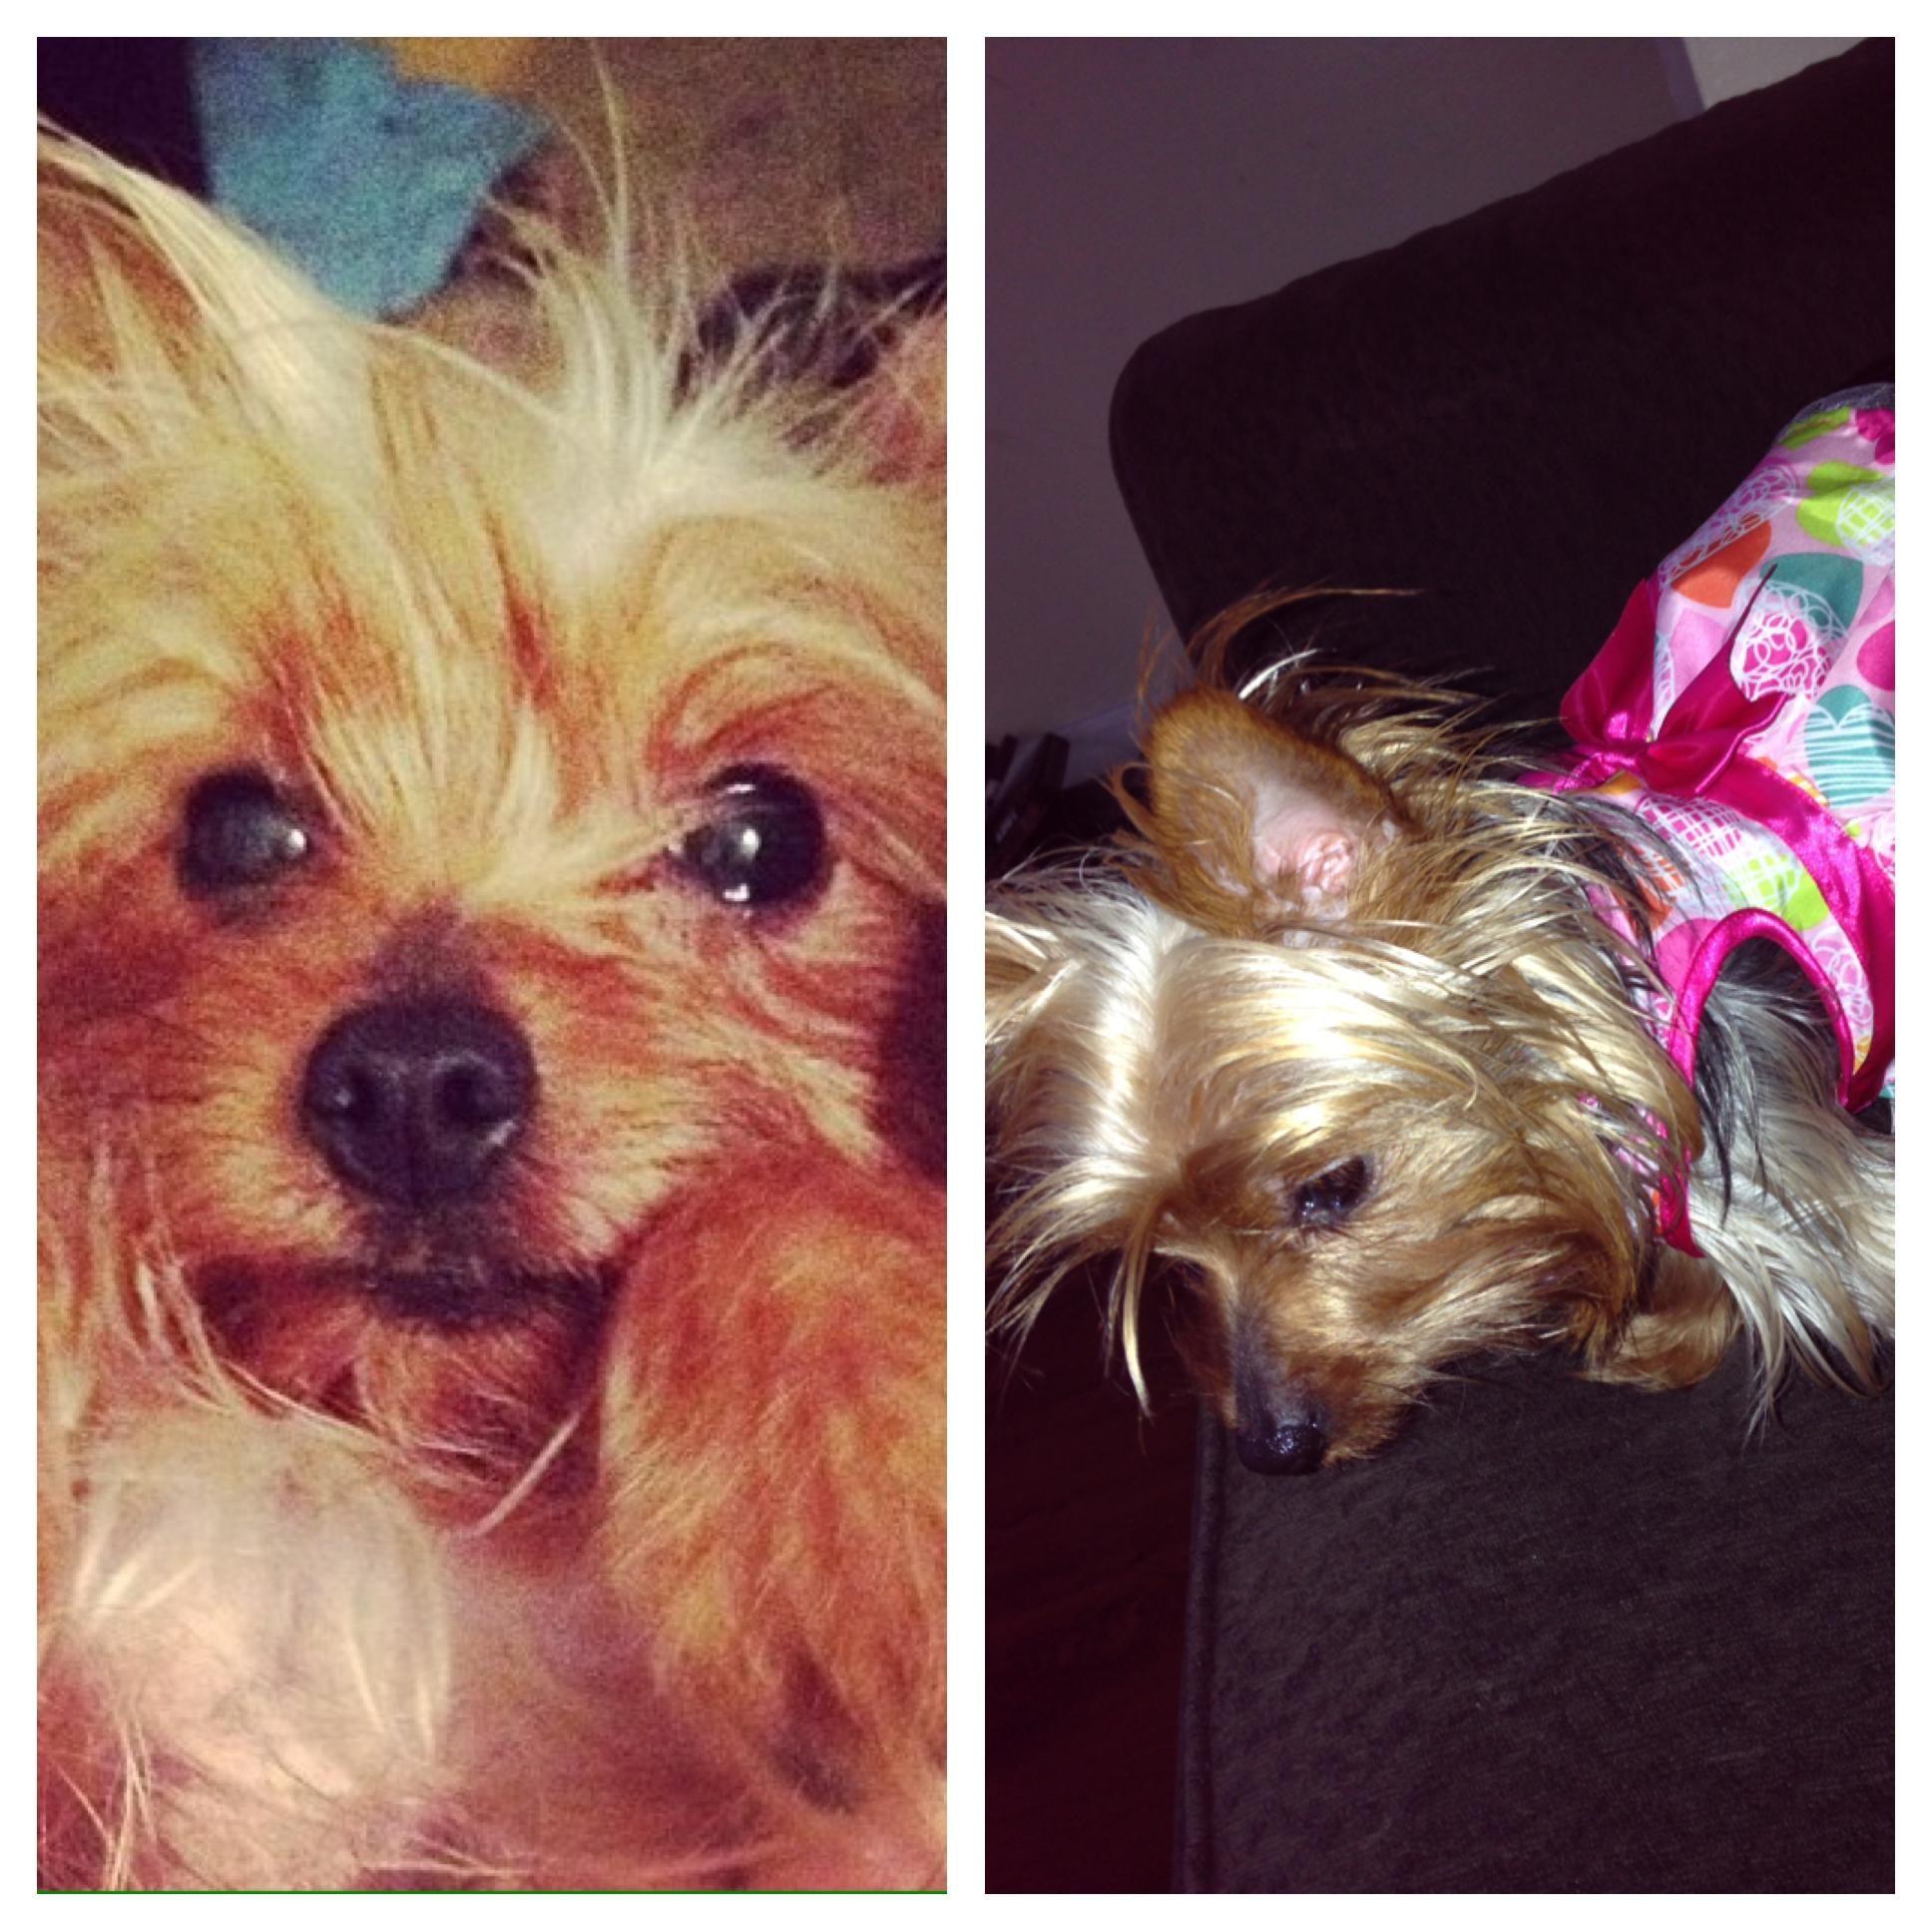 LOST DOG*** 4 year old female teacup Yorkie NAME Queenie